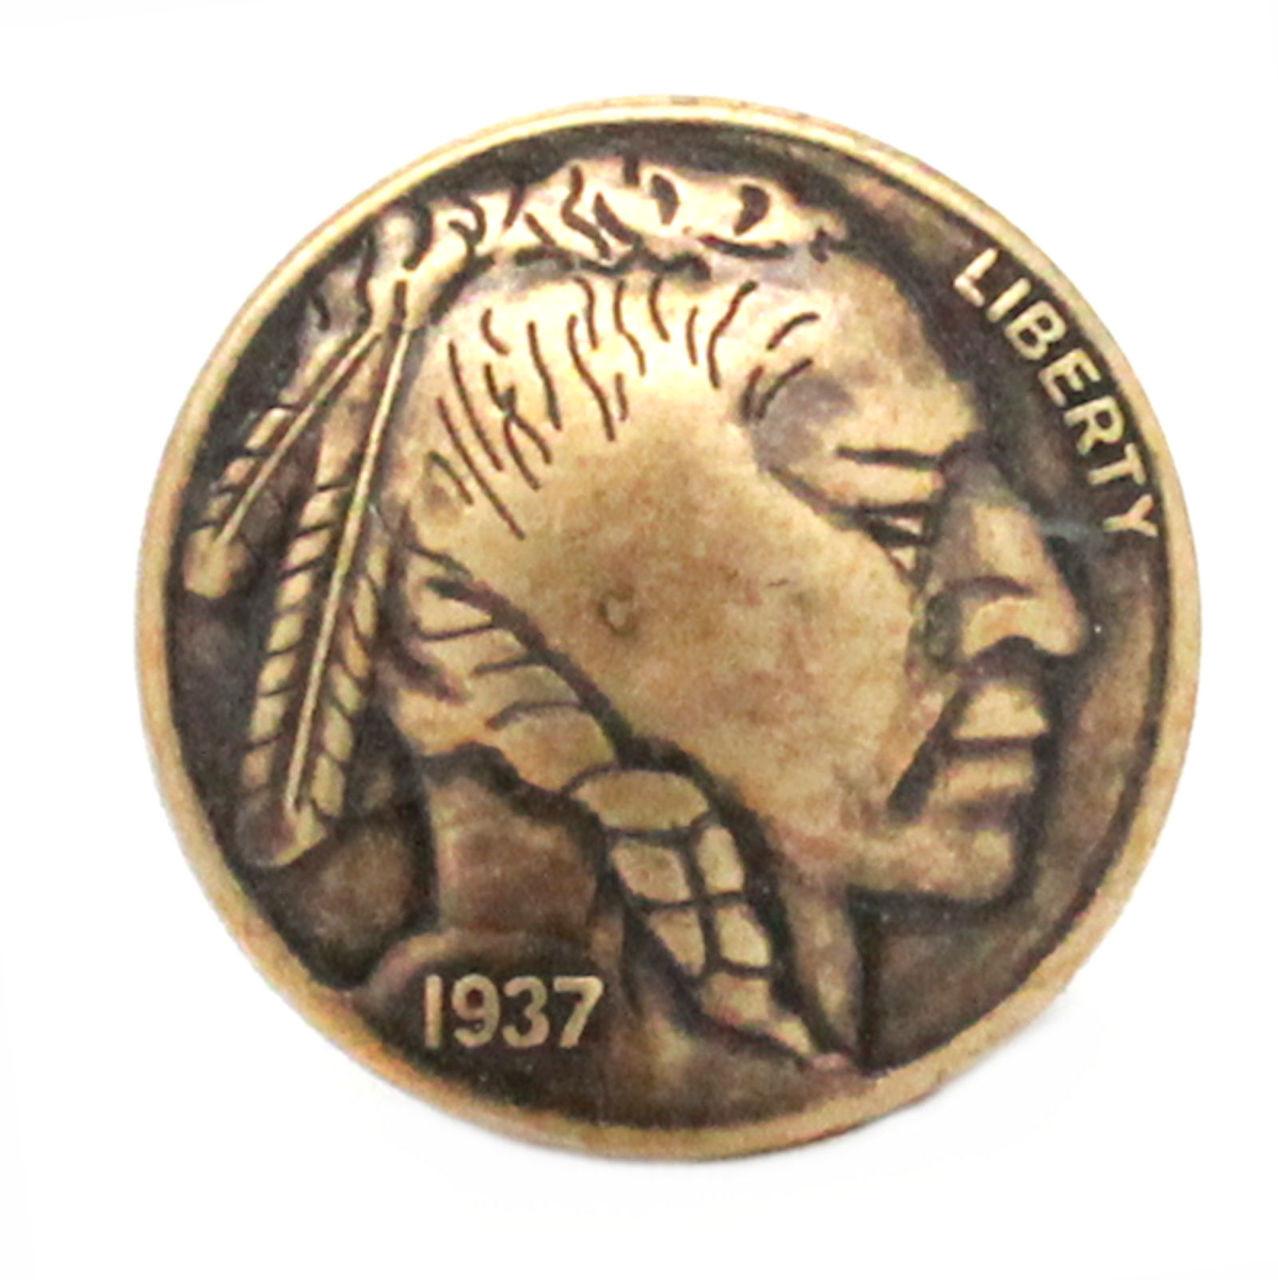 Indian nickel antique brass front